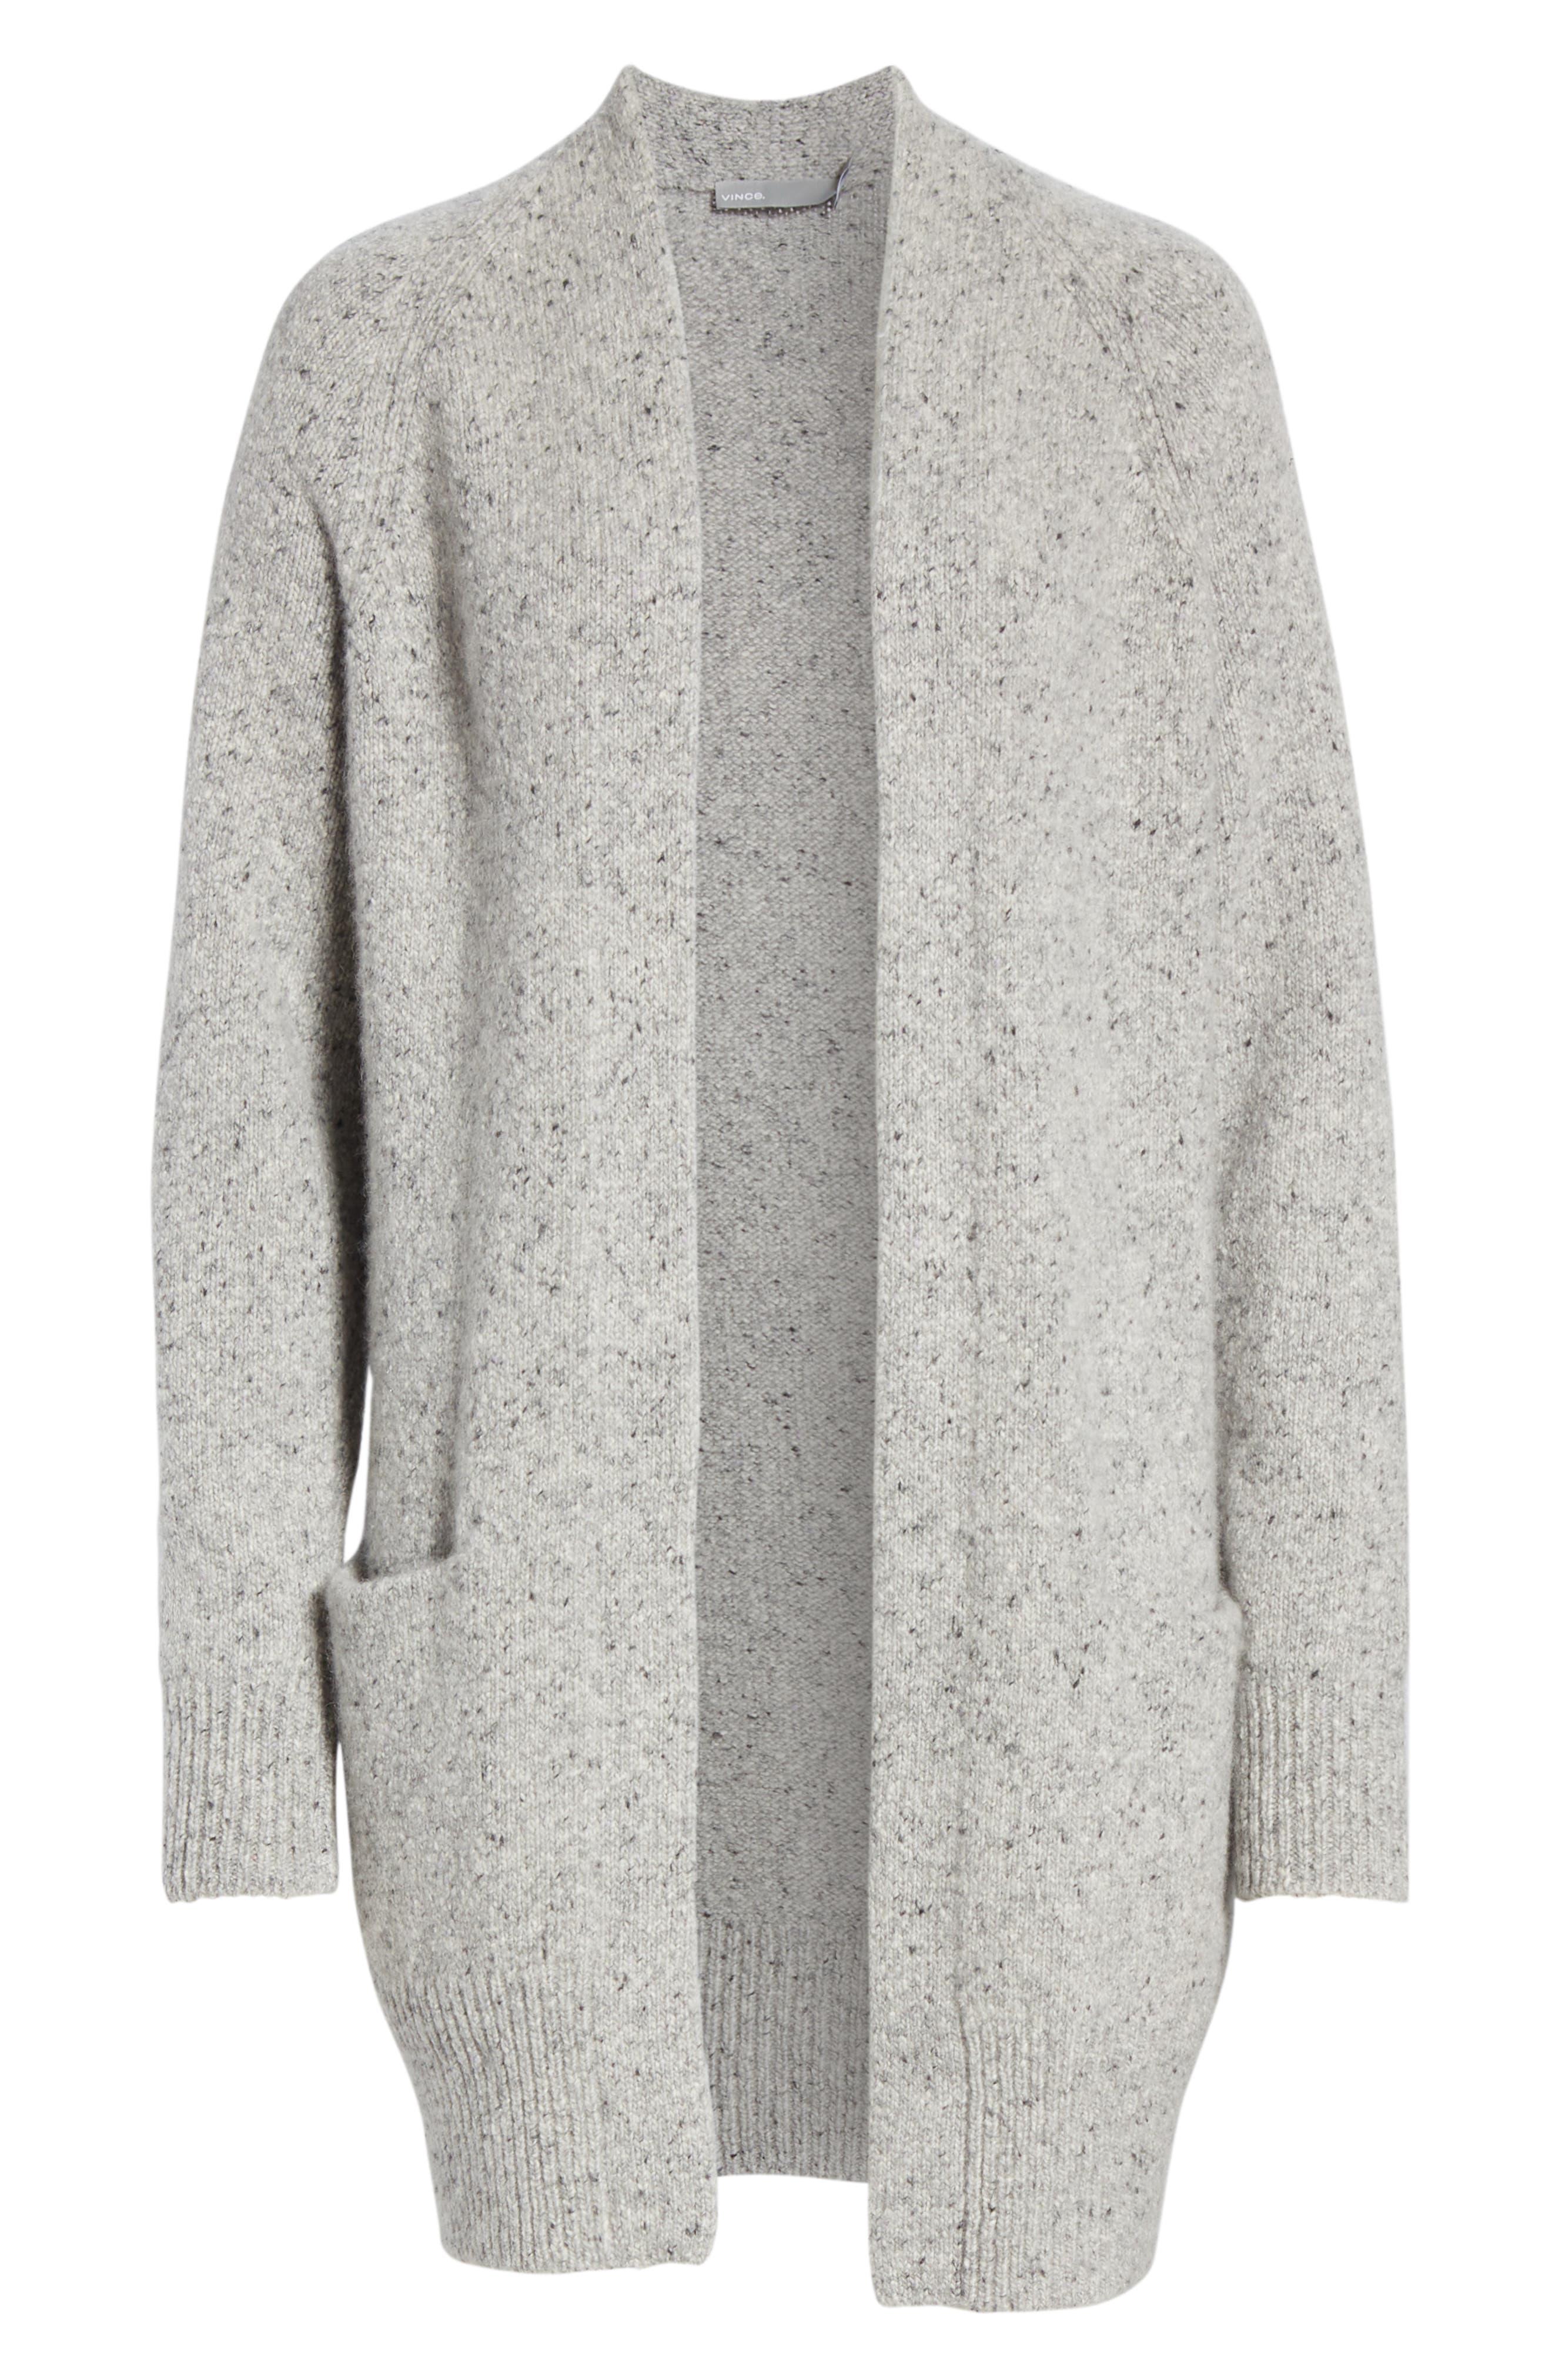 Cashmere Raglan Sleeve Open Front Cardigan,                             Alternate thumbnail 6, color,                             SOFT GREY